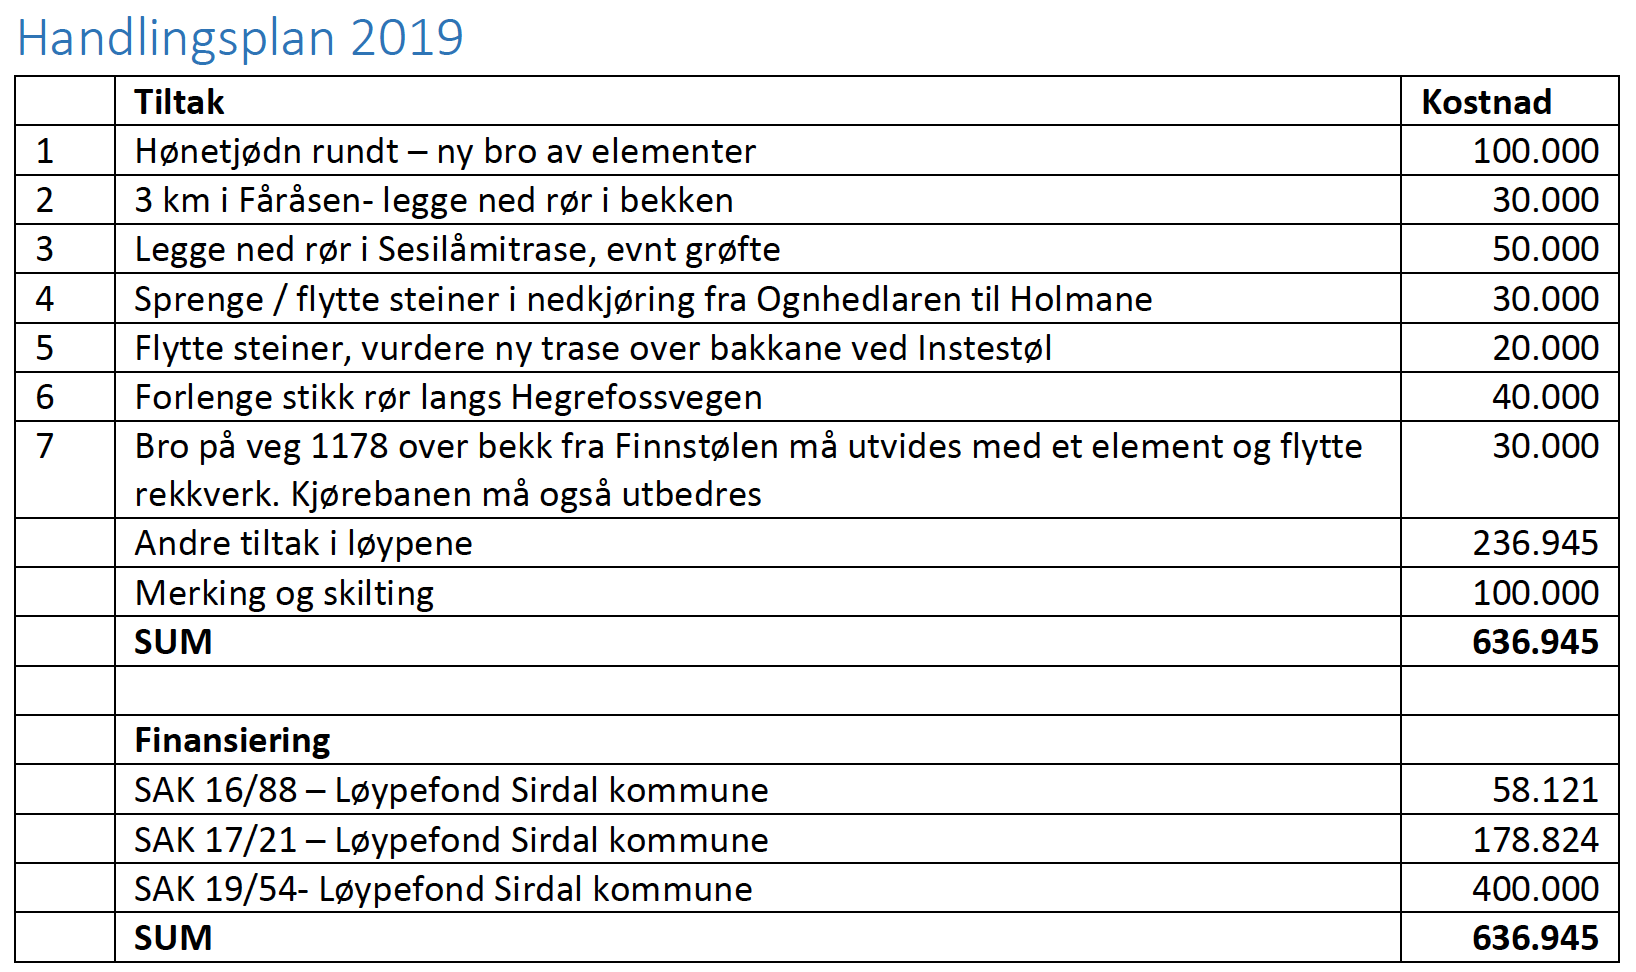 Macintosh HD:Users:Lsir:Dropbox:Skjermbilder:Skjermbilde 2019-06-08 09.51.30.png